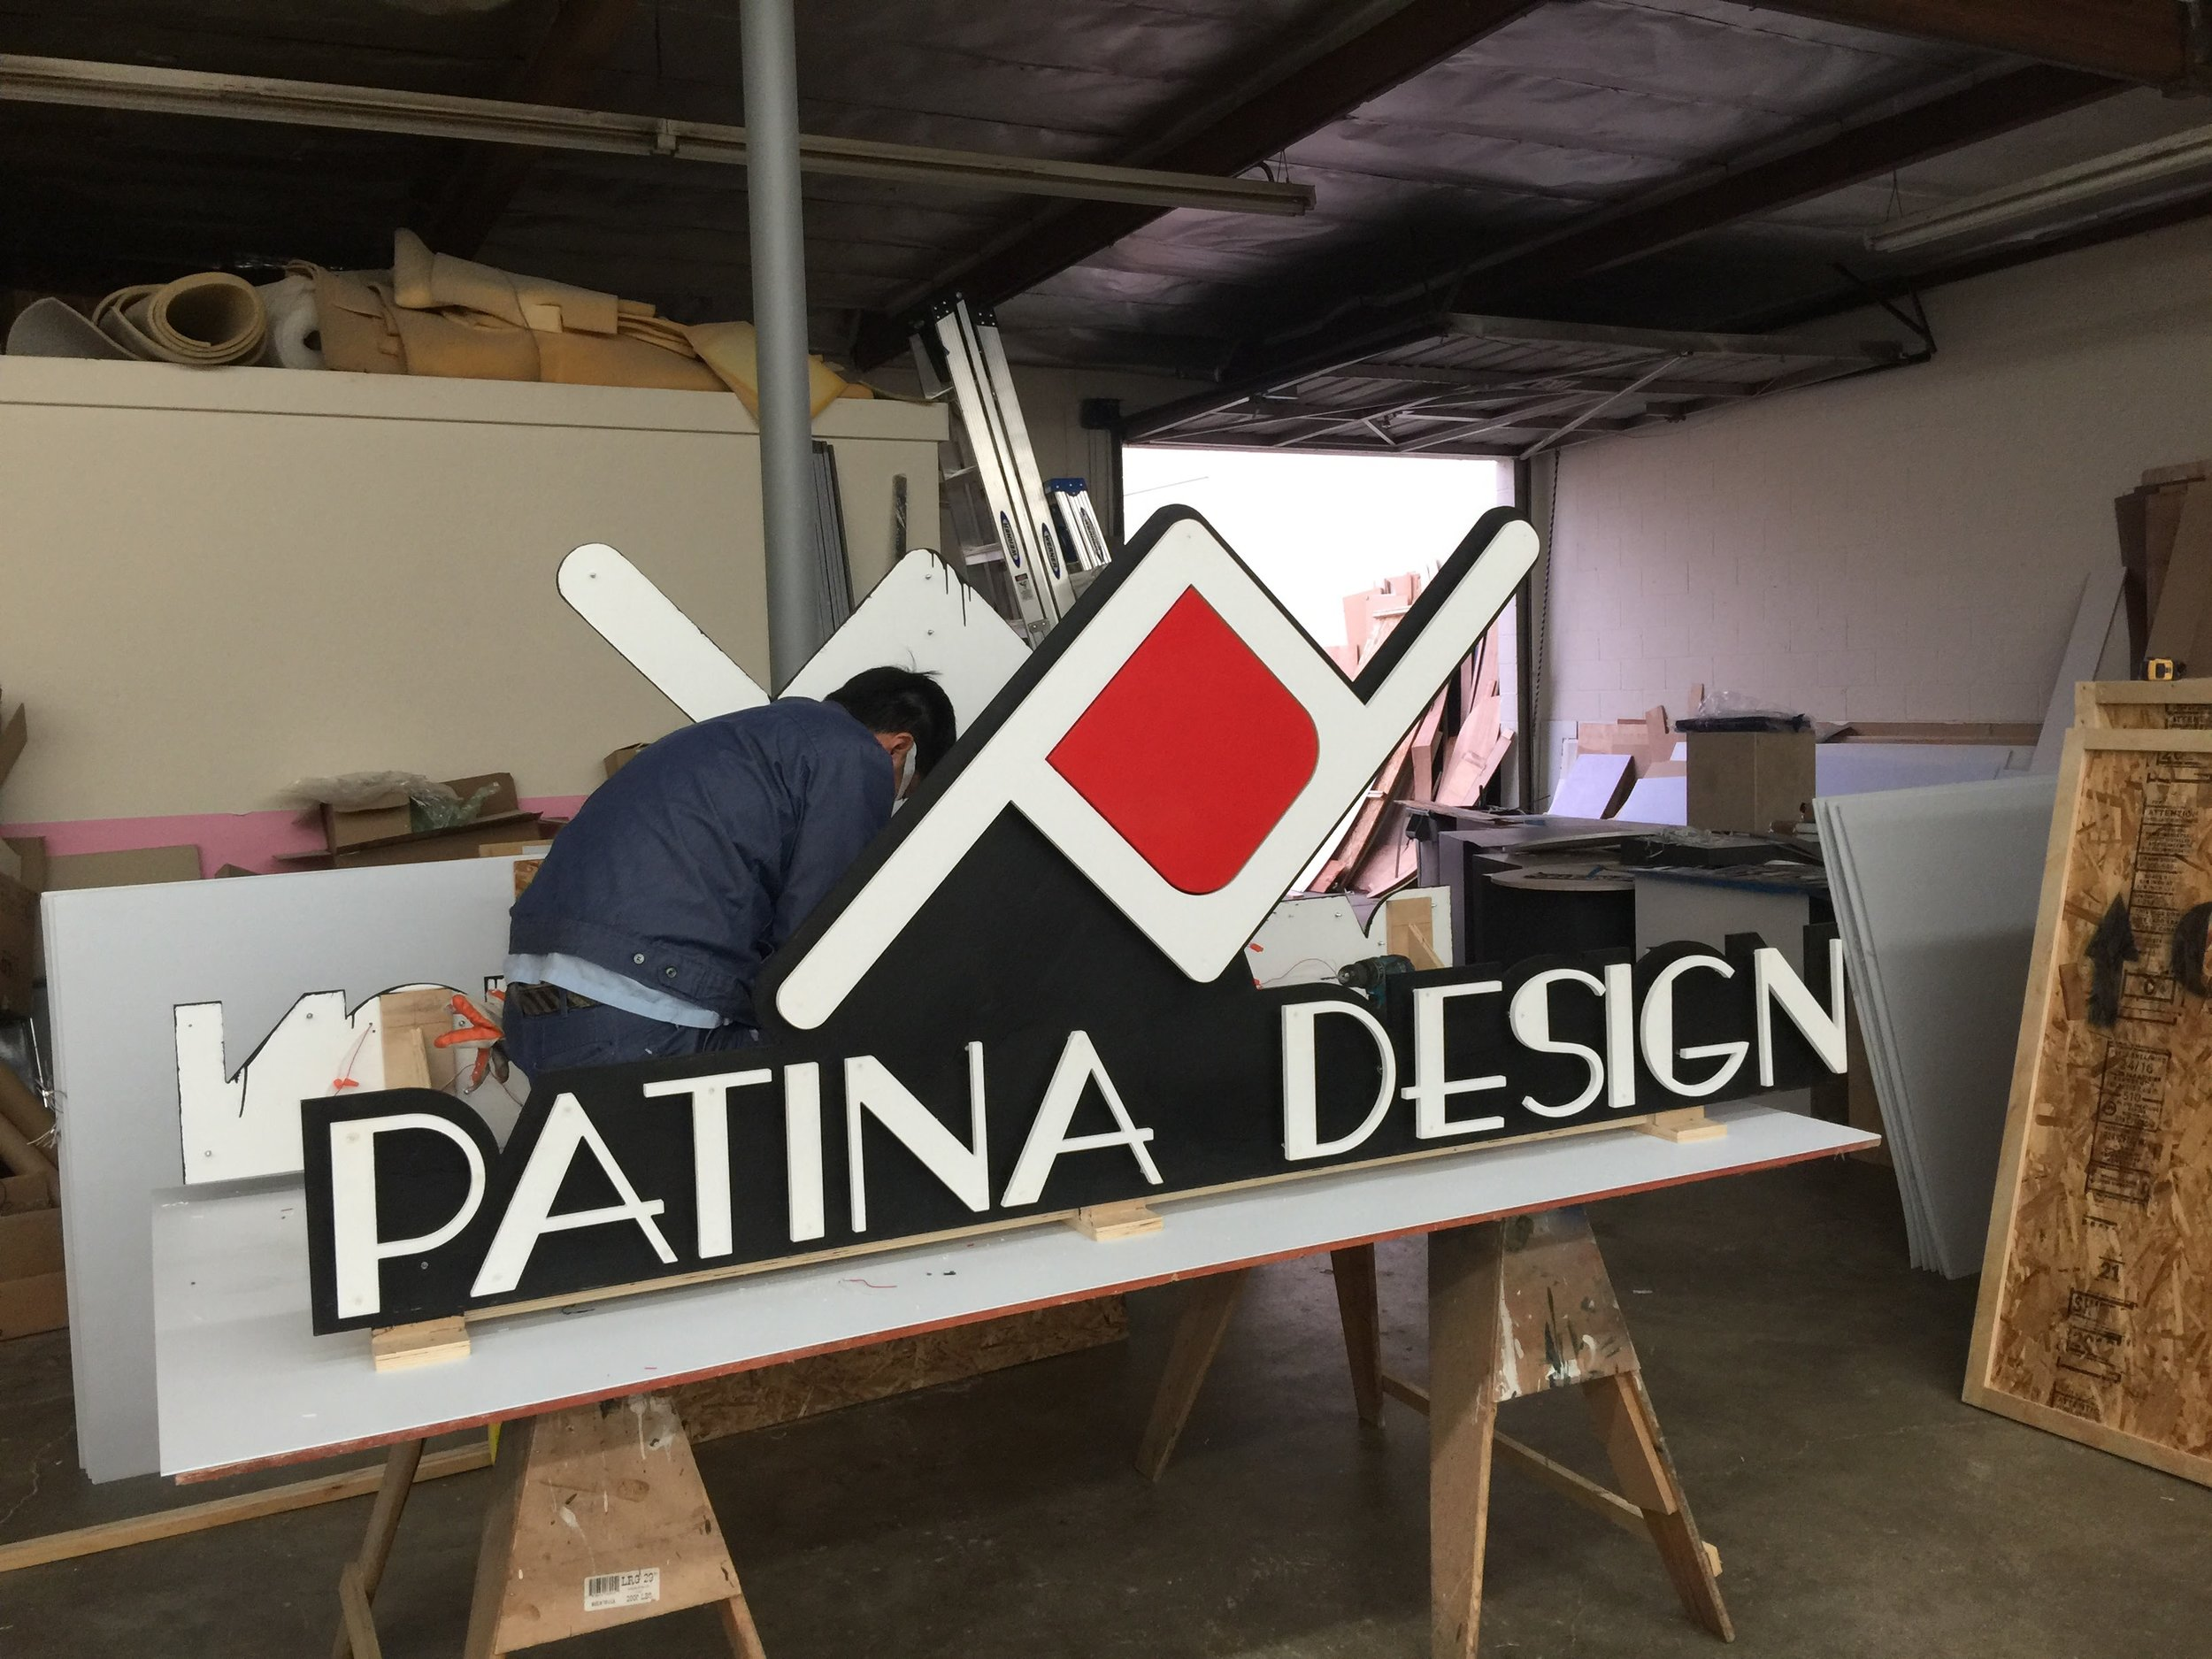 Patina Design Logo I resized to be suited for large LED sign